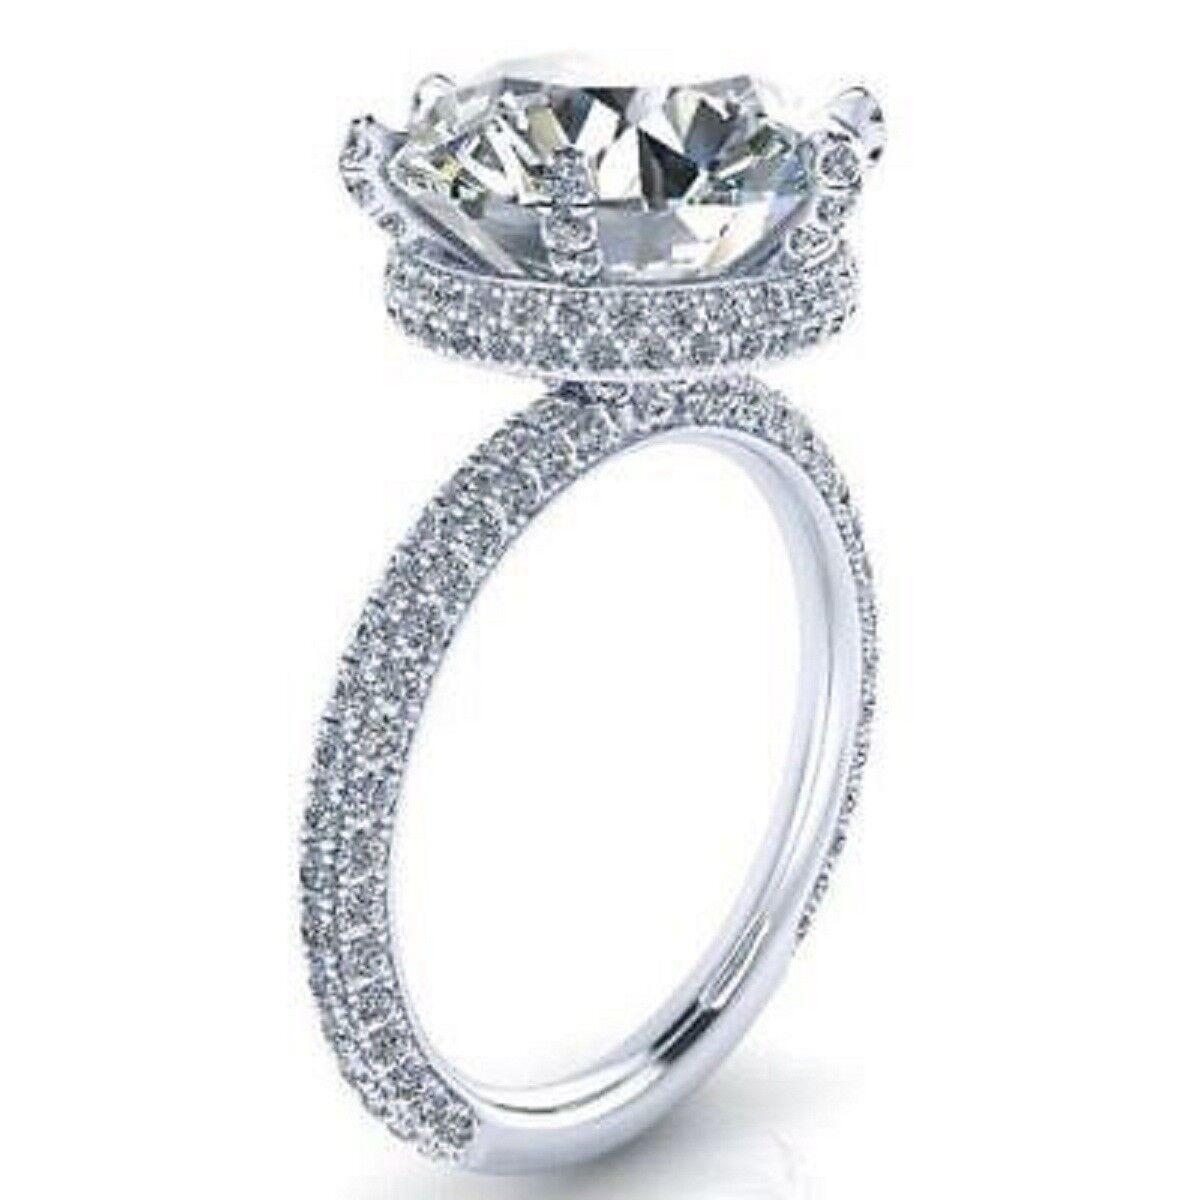 Certified 14K White gold 3.80Ct White Round Diamond Engagement & Wedding Ring